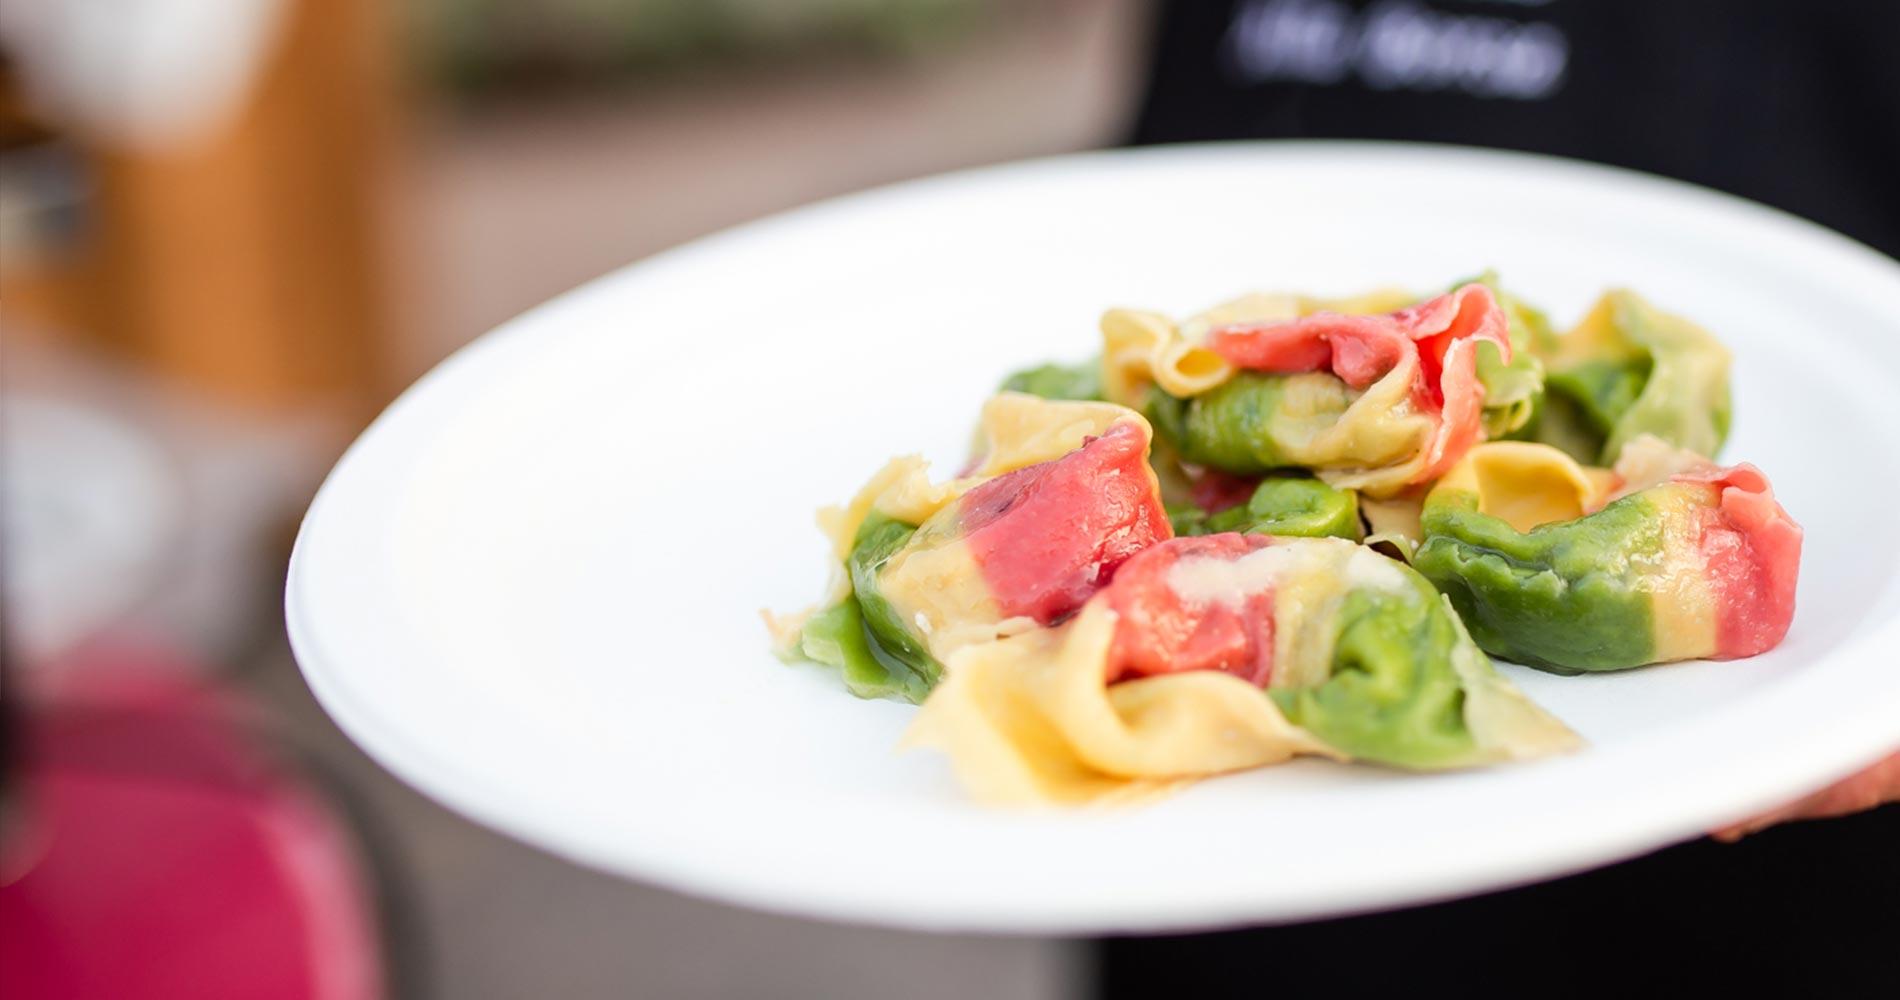 Relais_Chateaux_Hotel_Rosengarten_Kirchberg_Kitzbuehel-Gourmet-Event-Dolce-Vida-Bella-Italia-3colore